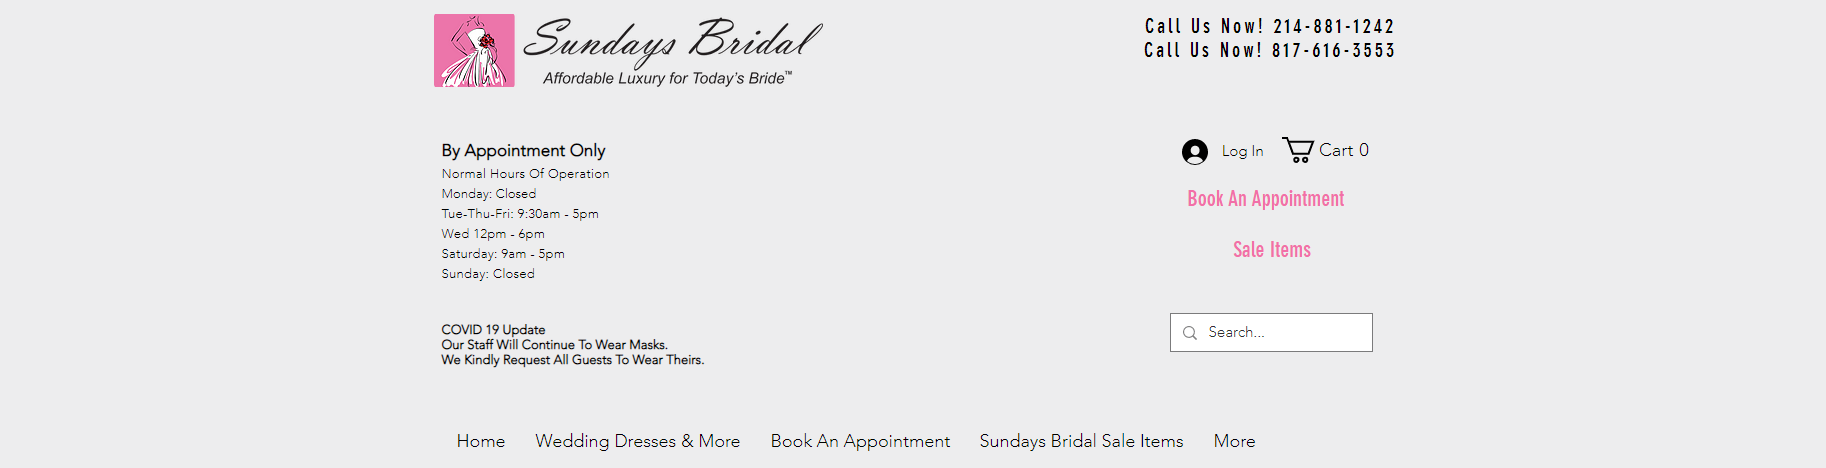 Sundays Bridal